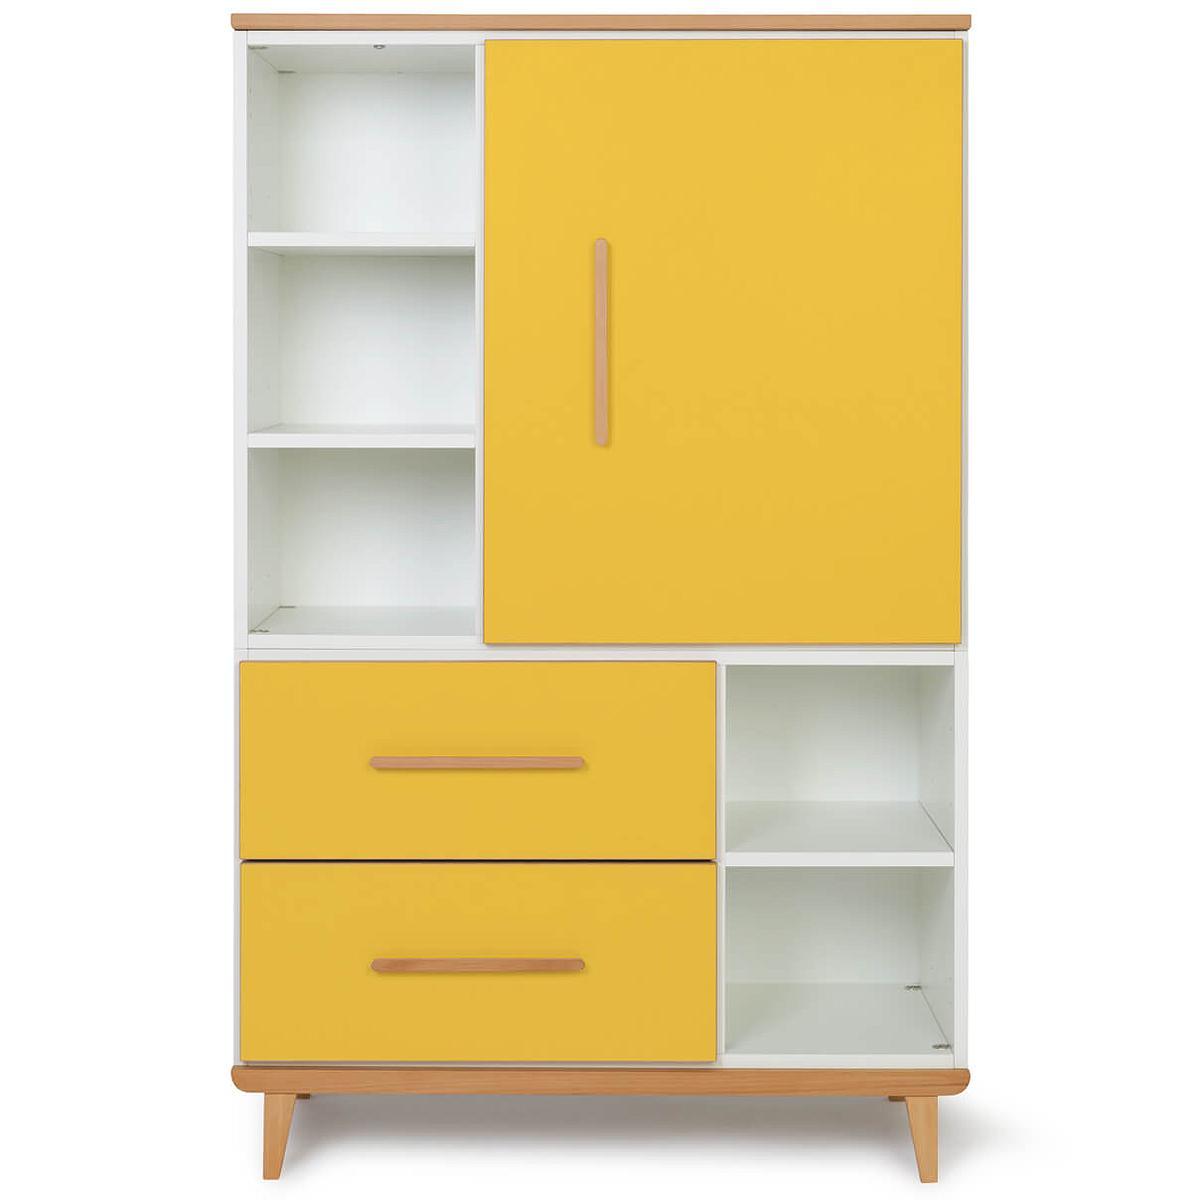 Wookids - Armoire 147cm 1 porte NADO yellow